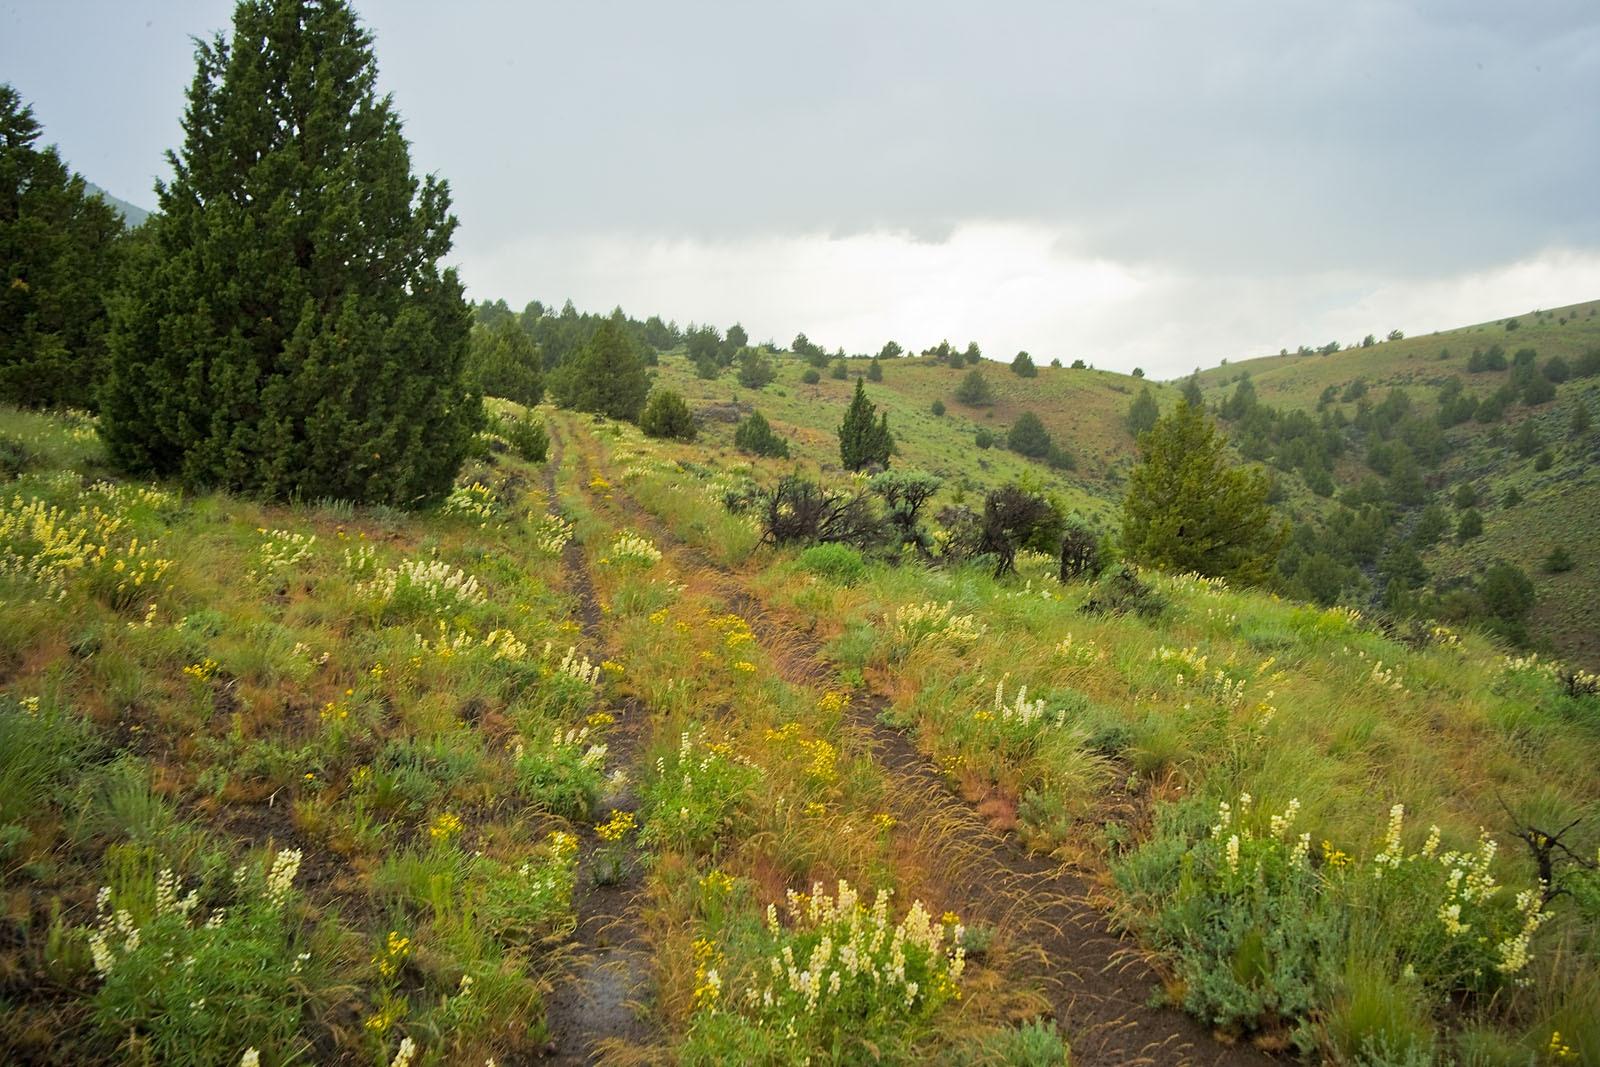 Bassett Scenic Landscape Vistas VQ4G3012